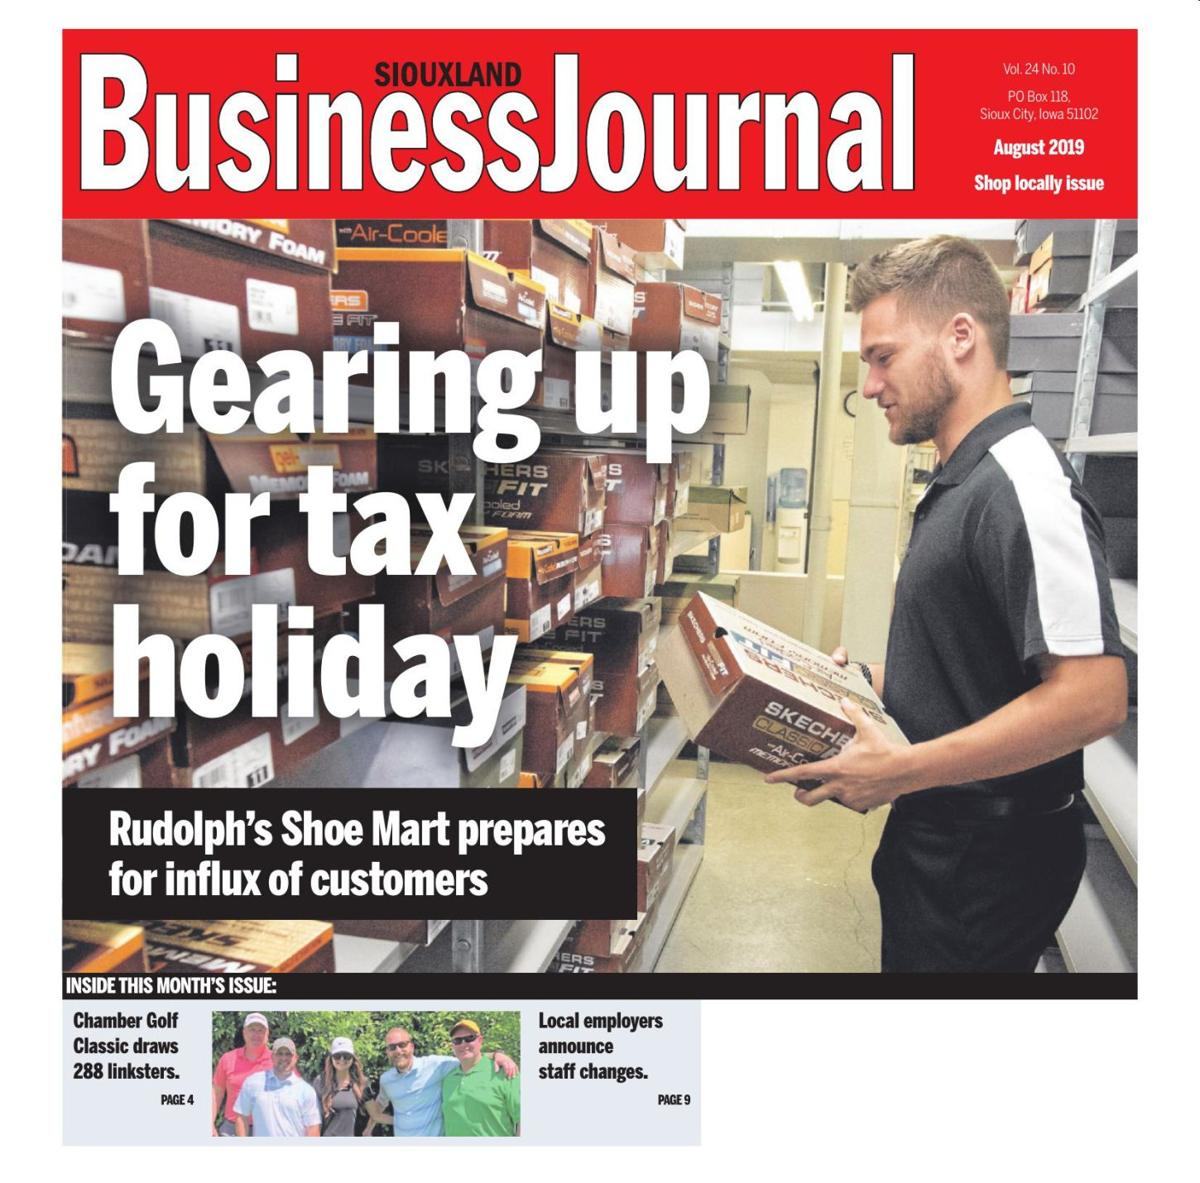 Siouxland Business Journal - August 2019